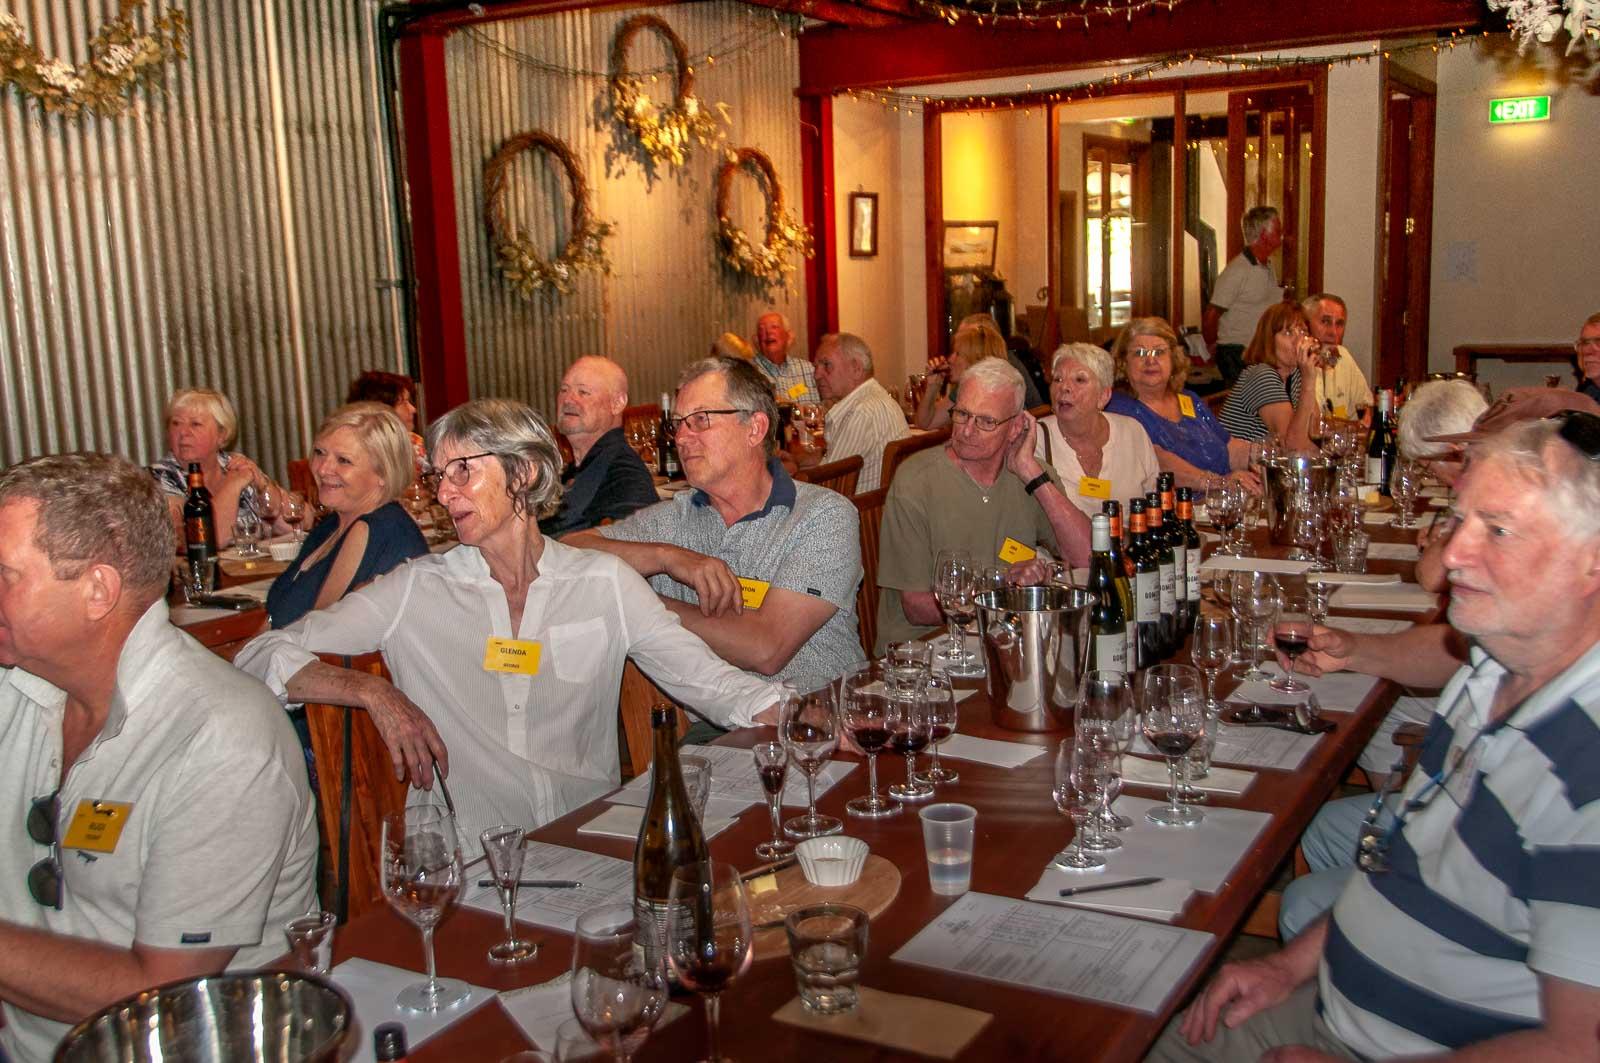 Wine tasting at Gomersal Wines